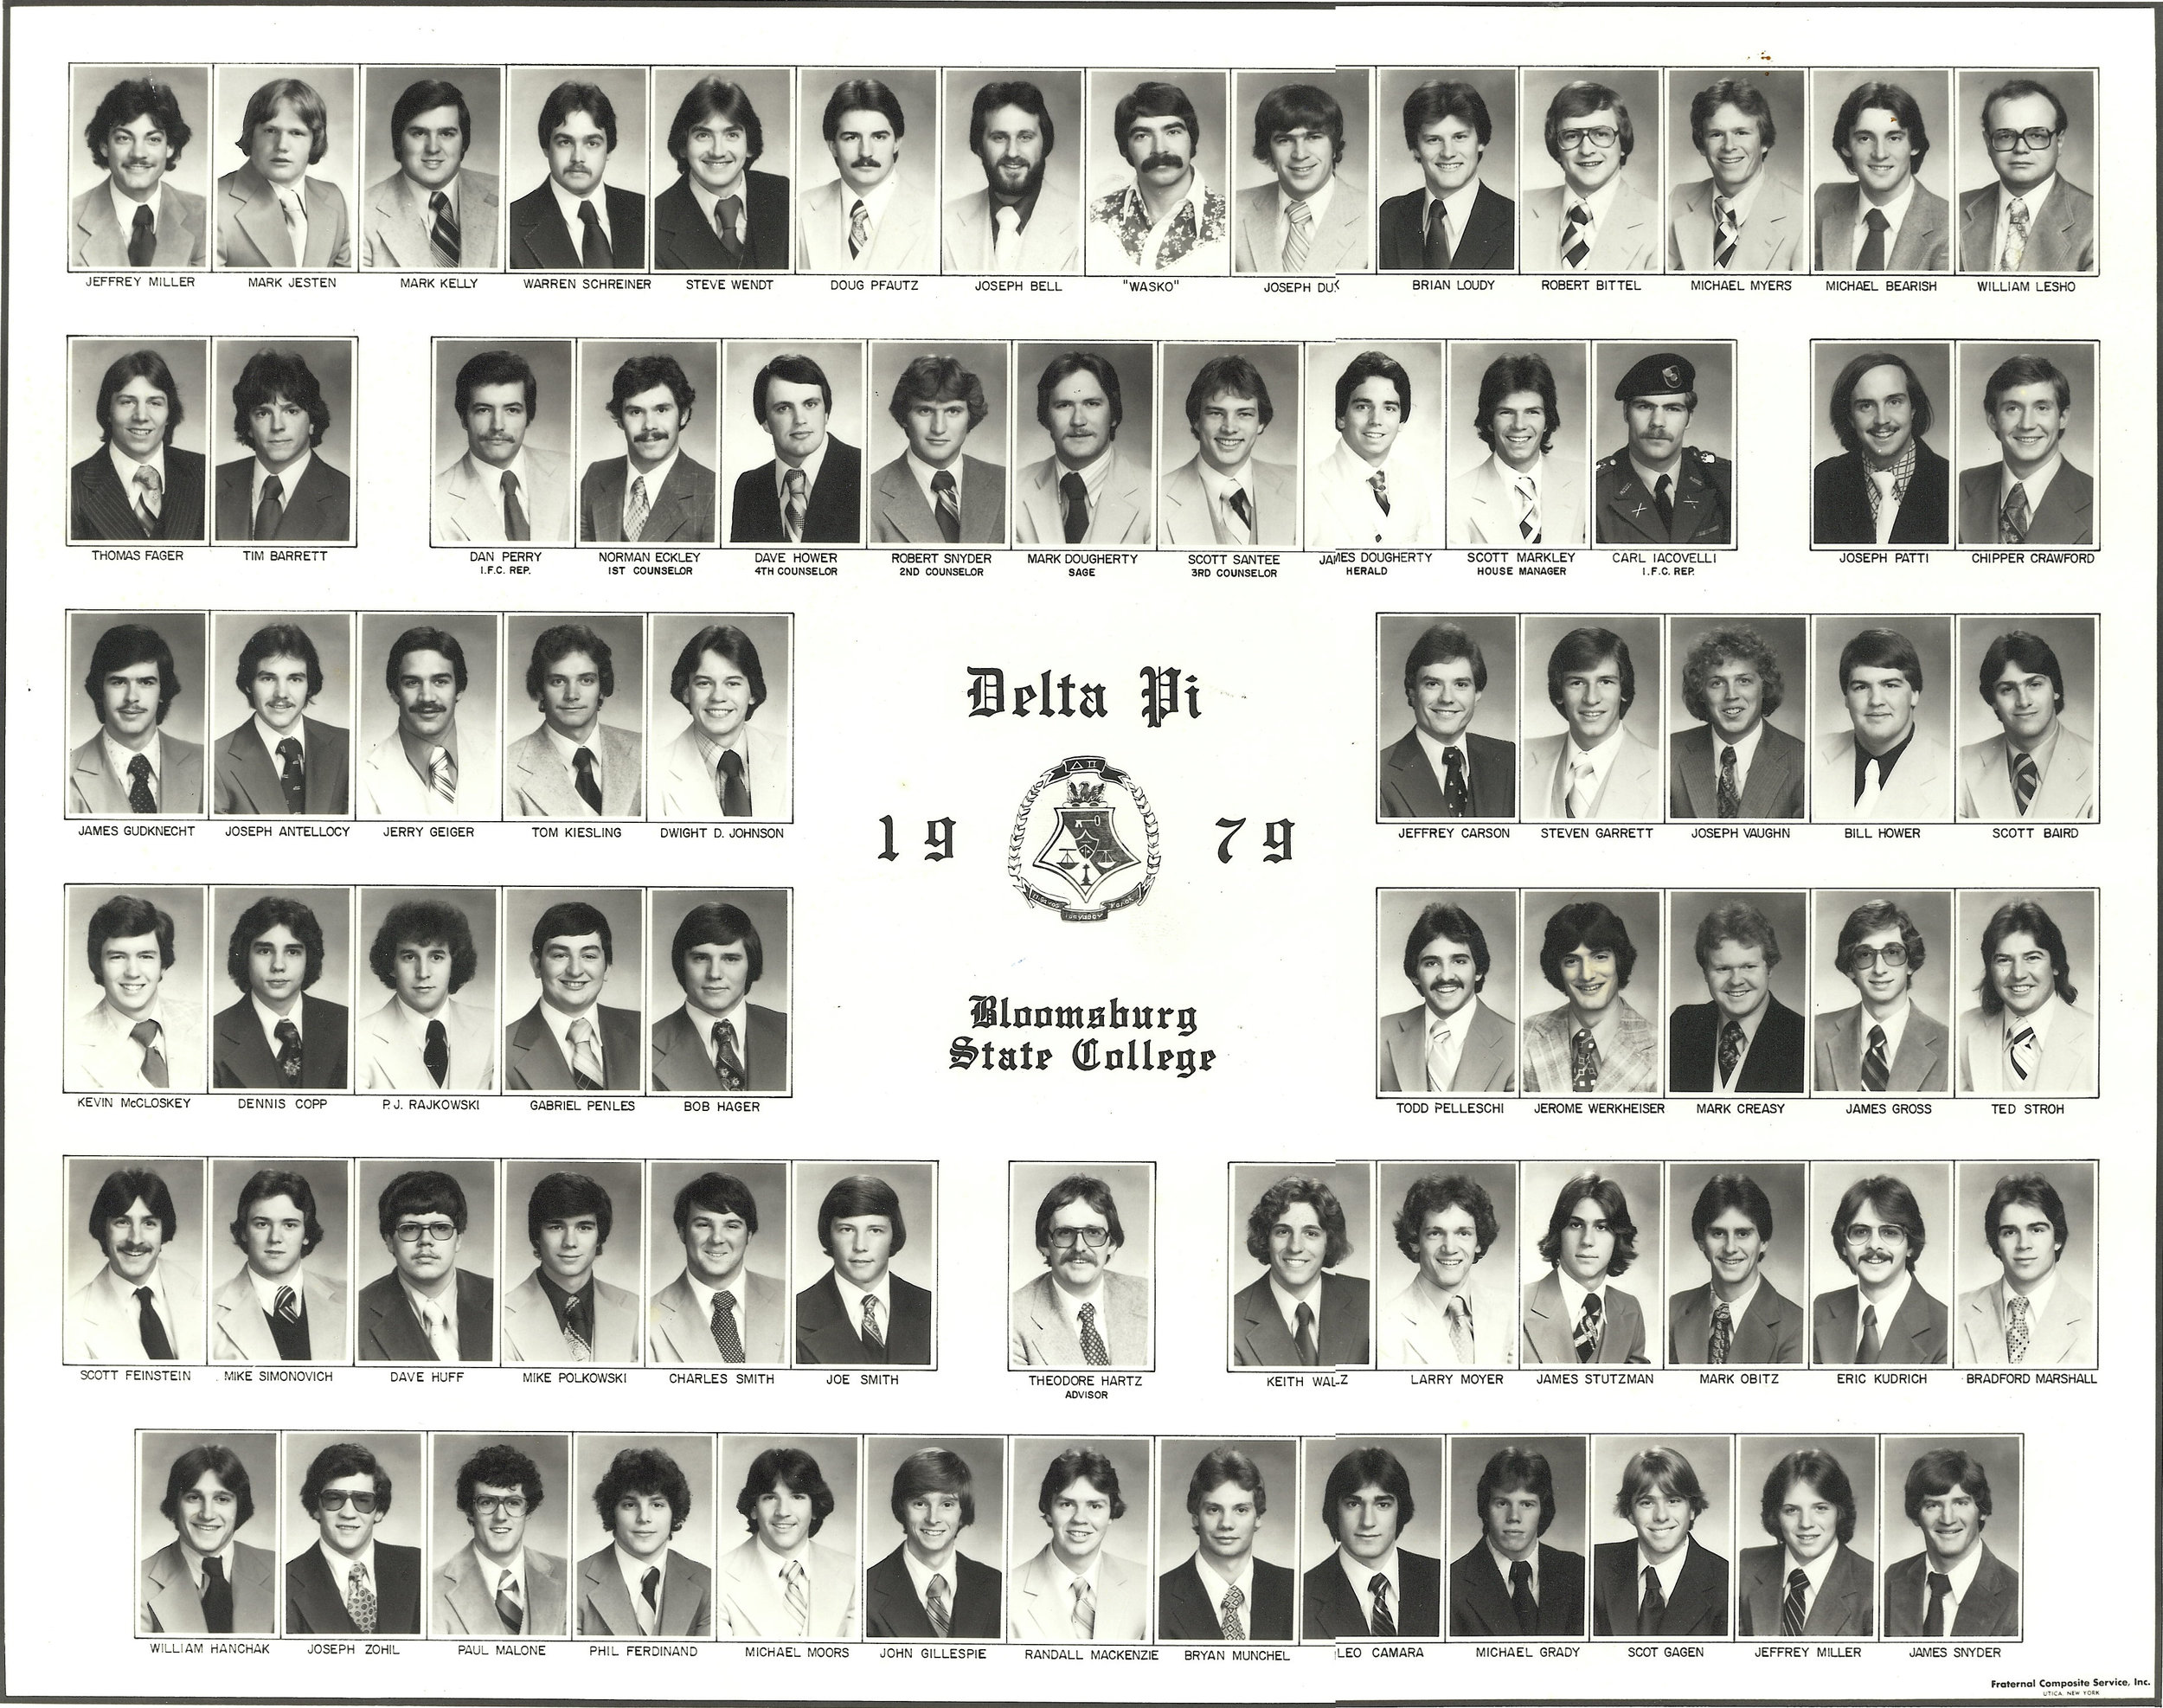 DeltaPi-1979-FinalEdit.jpg